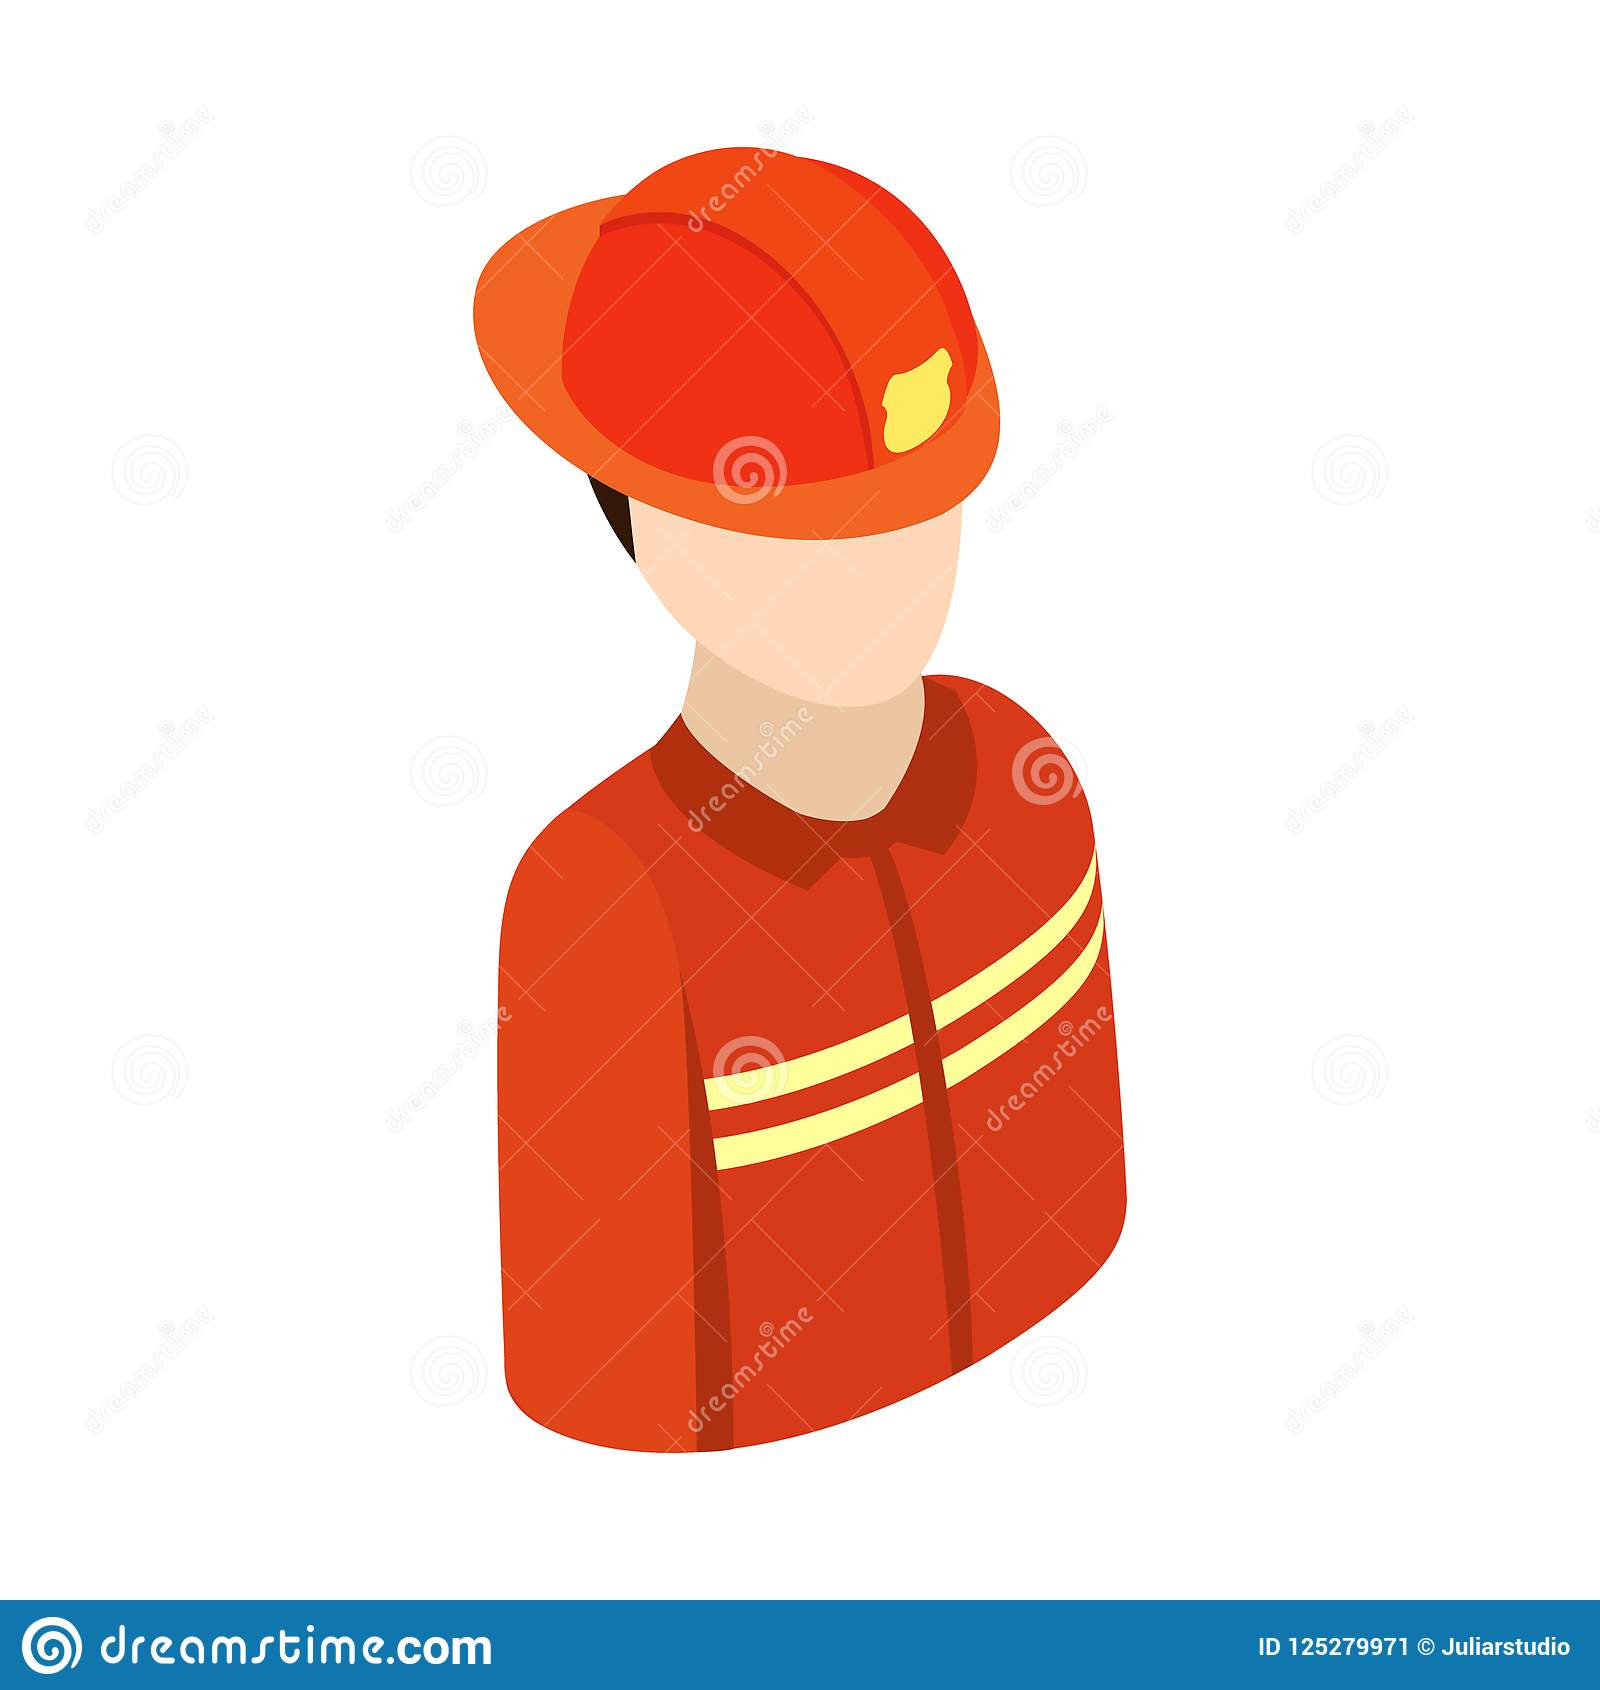 Fireman Isometric 3d Character Icon Stock Illustration ... dc988515c1e1